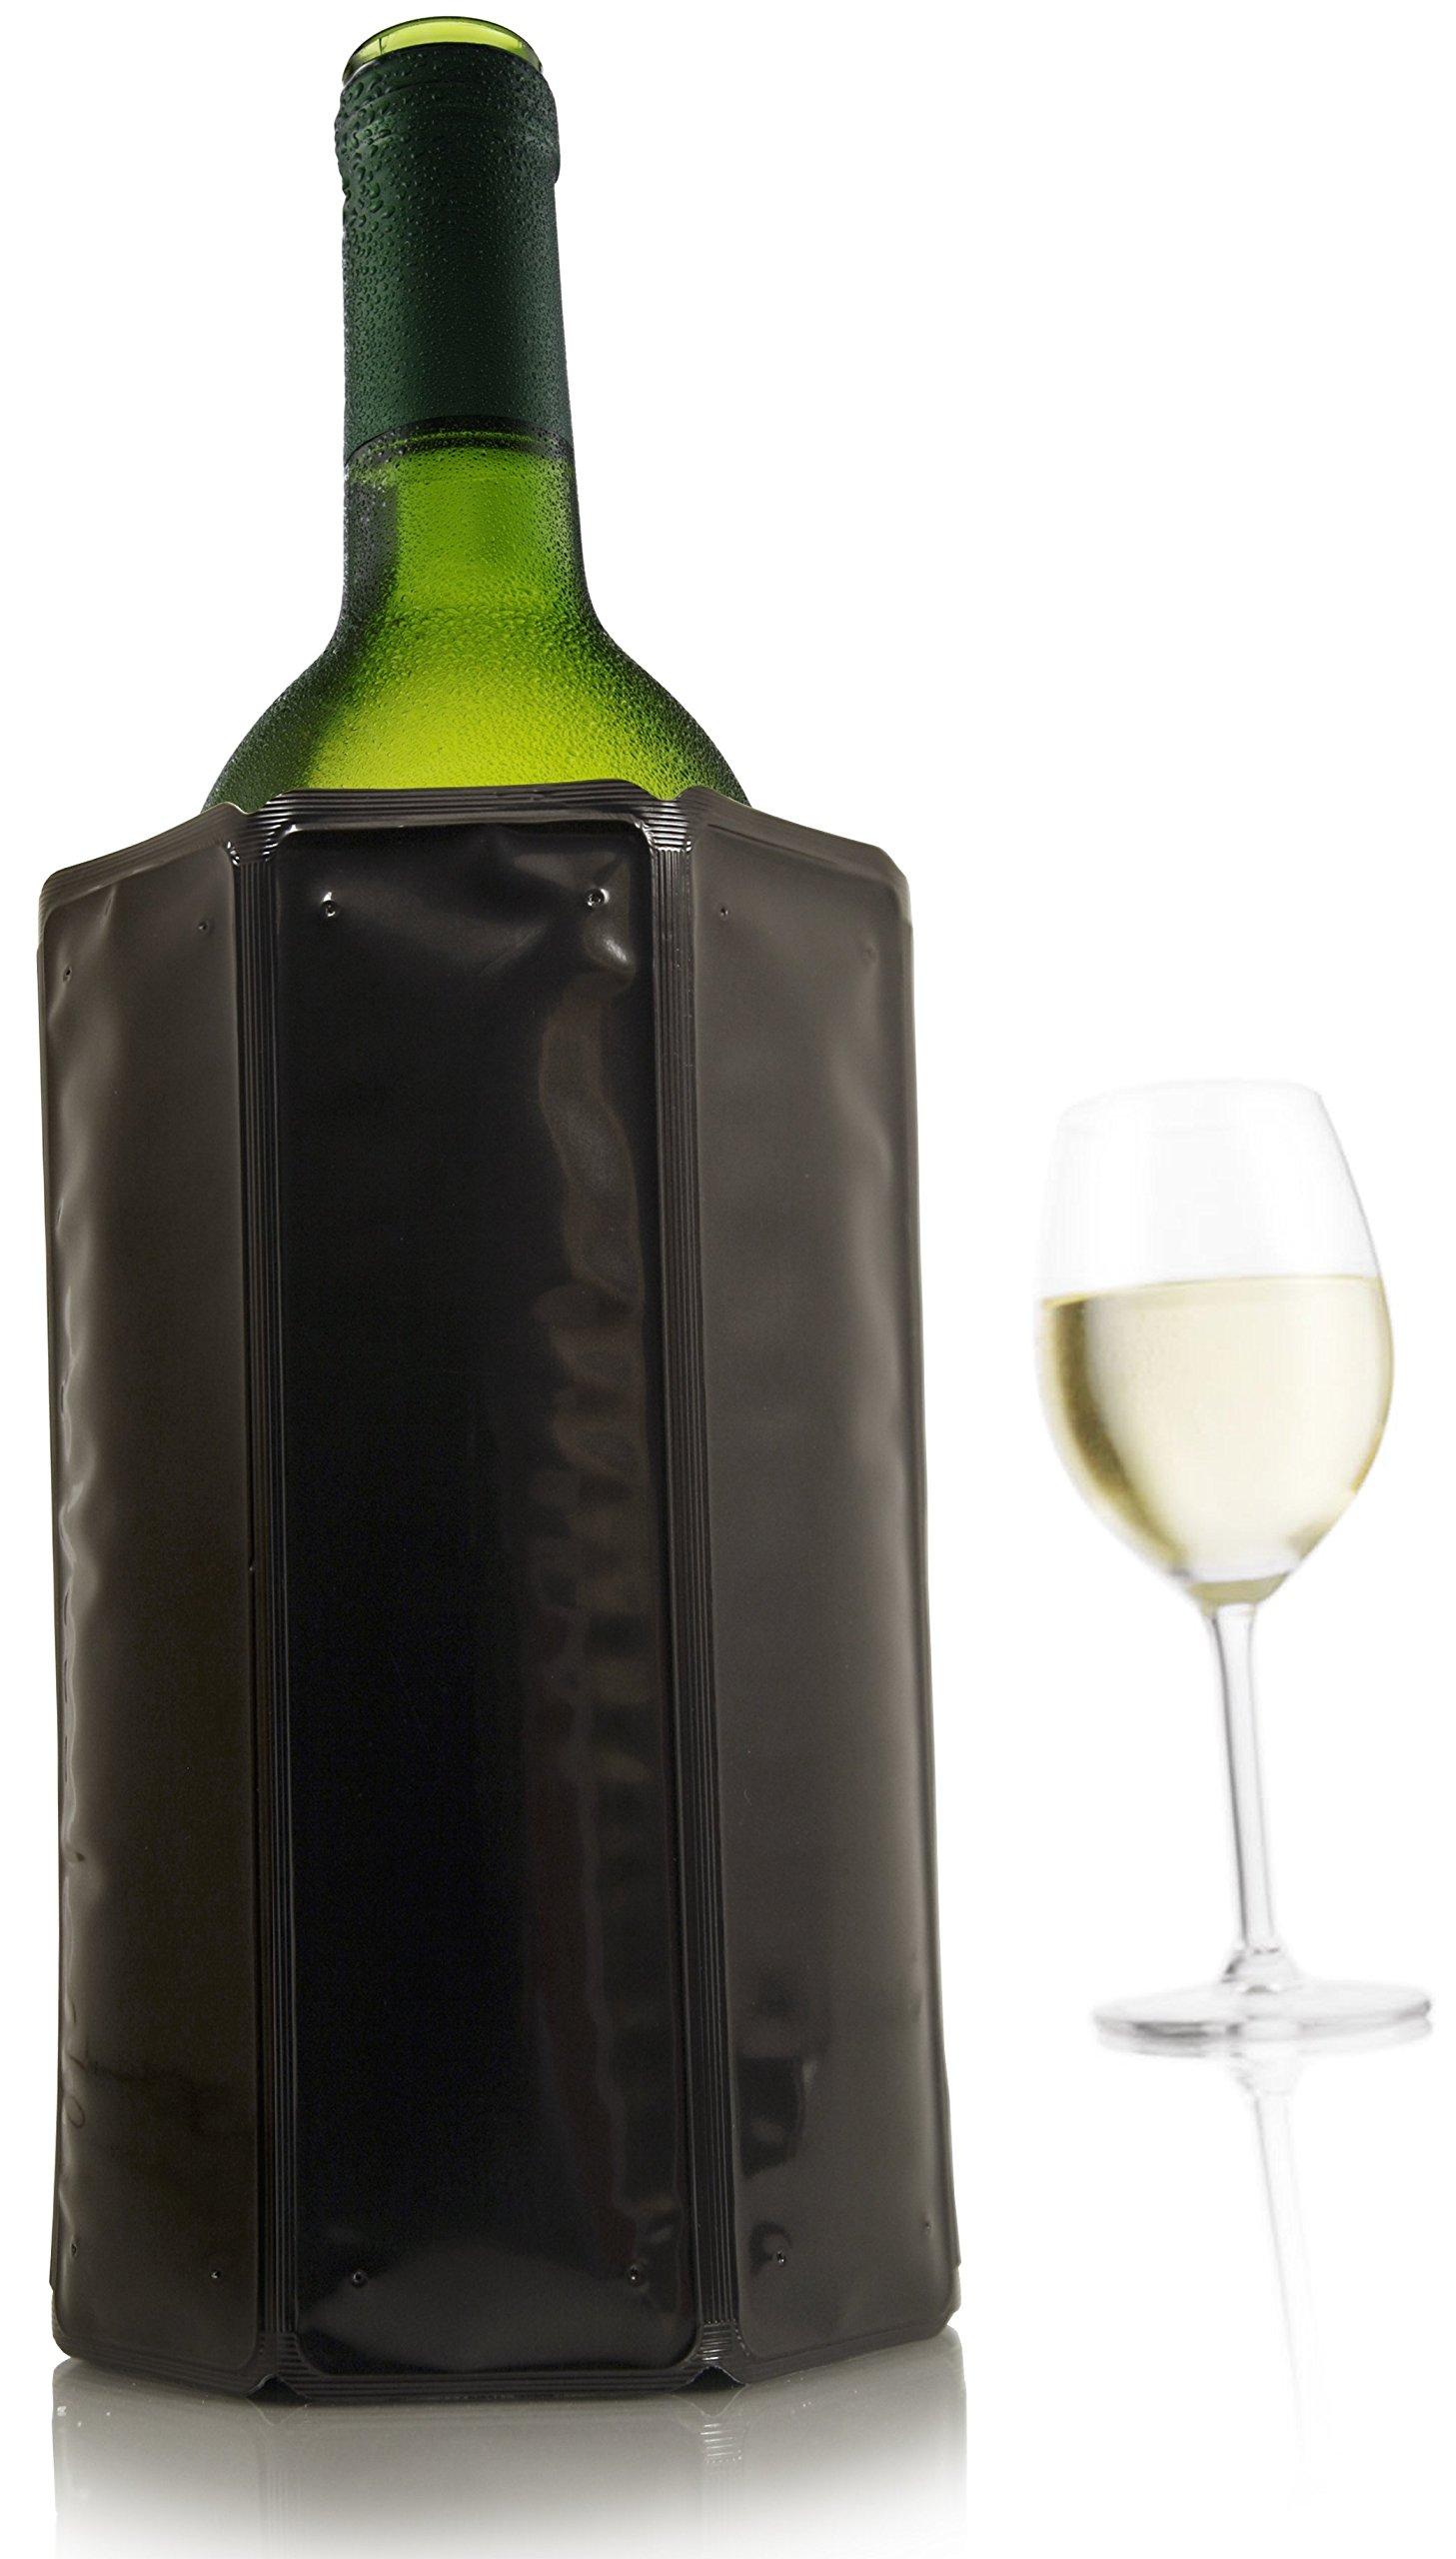 Vacu Vin Active Wine cooler gel pack, 6 7/8th, Black